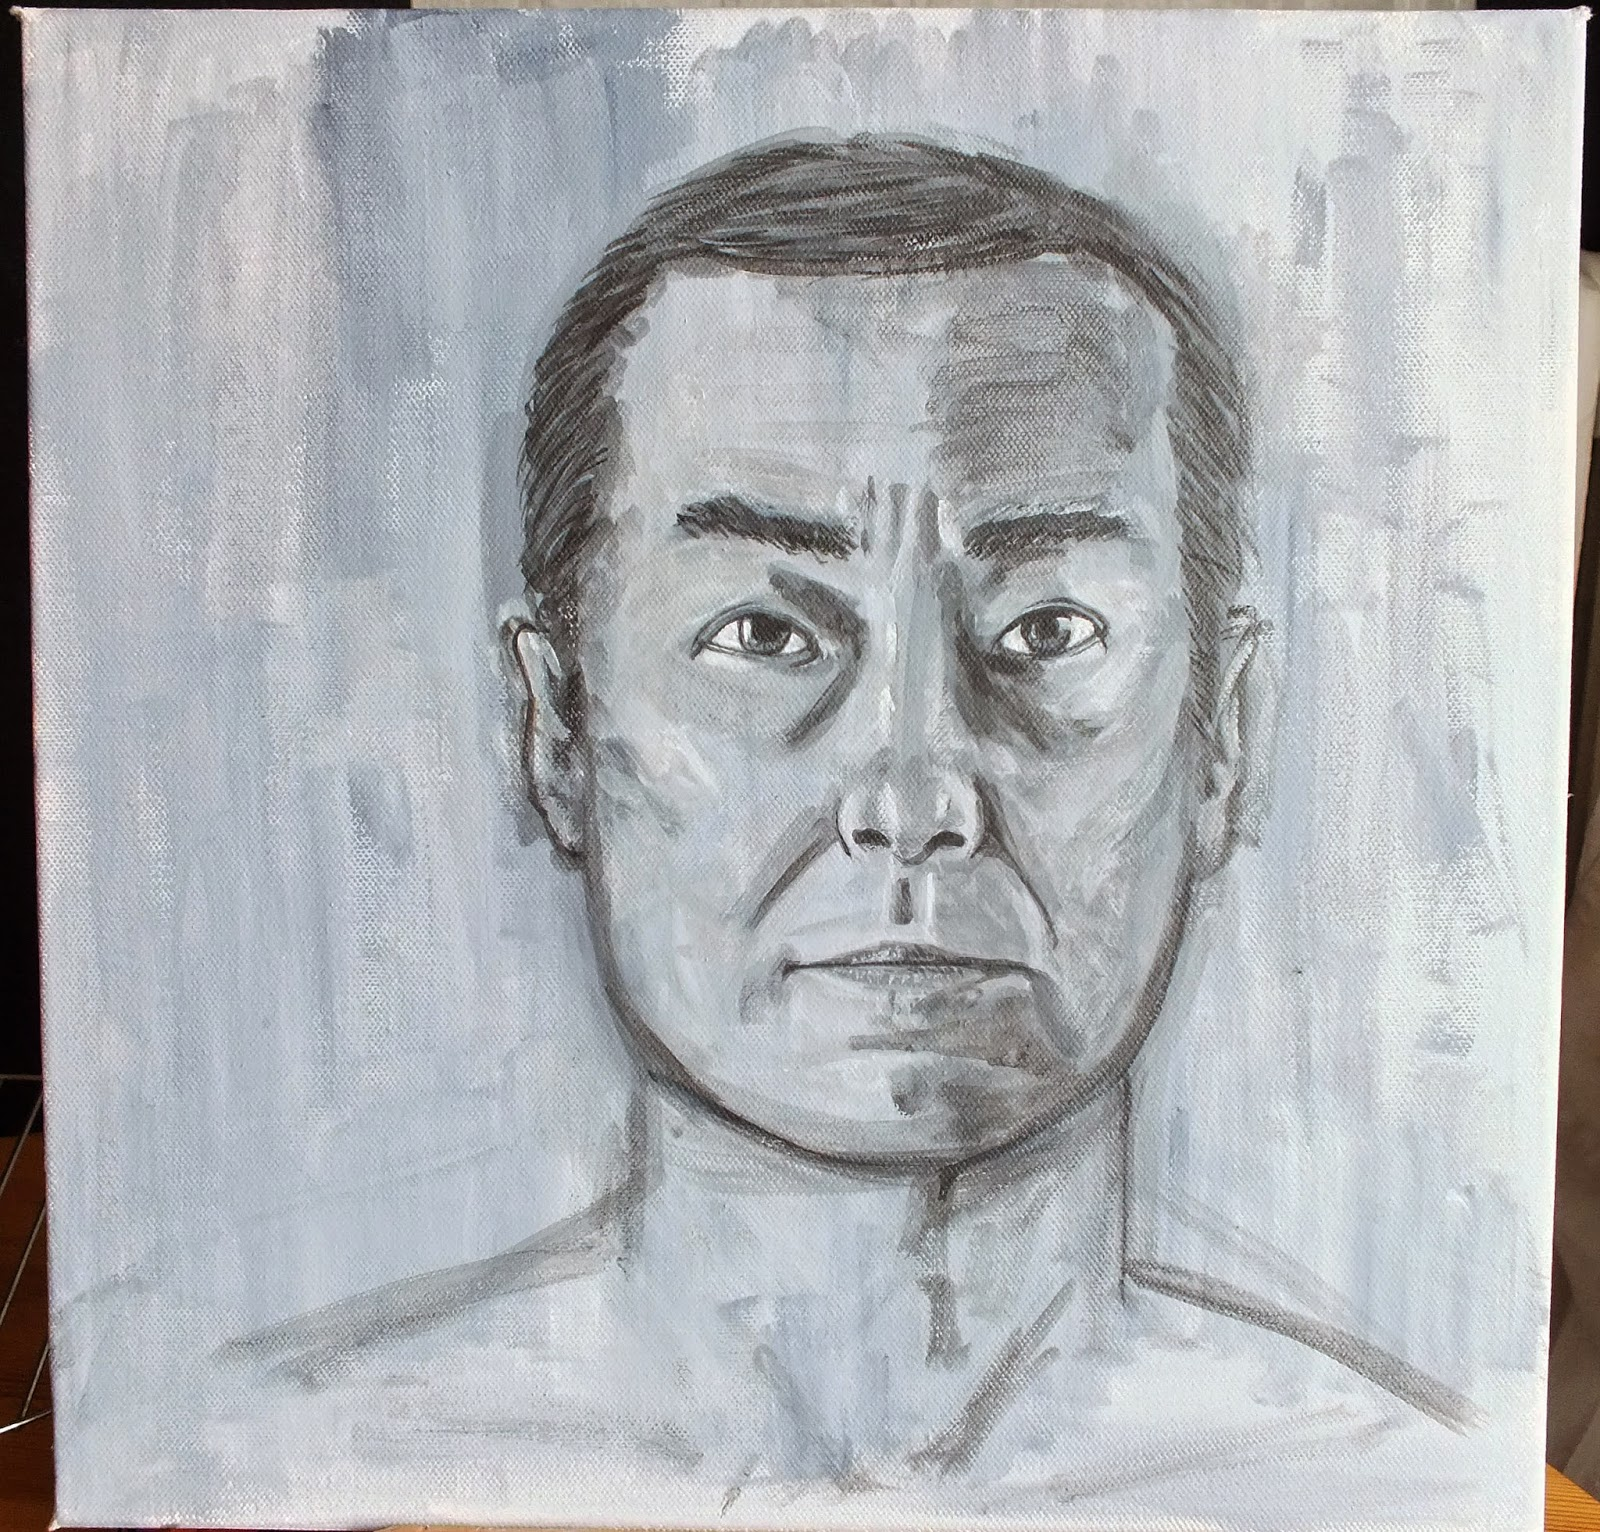 Kuroda Tetsuzan dans Dessin/Peinture kuroda%2B1